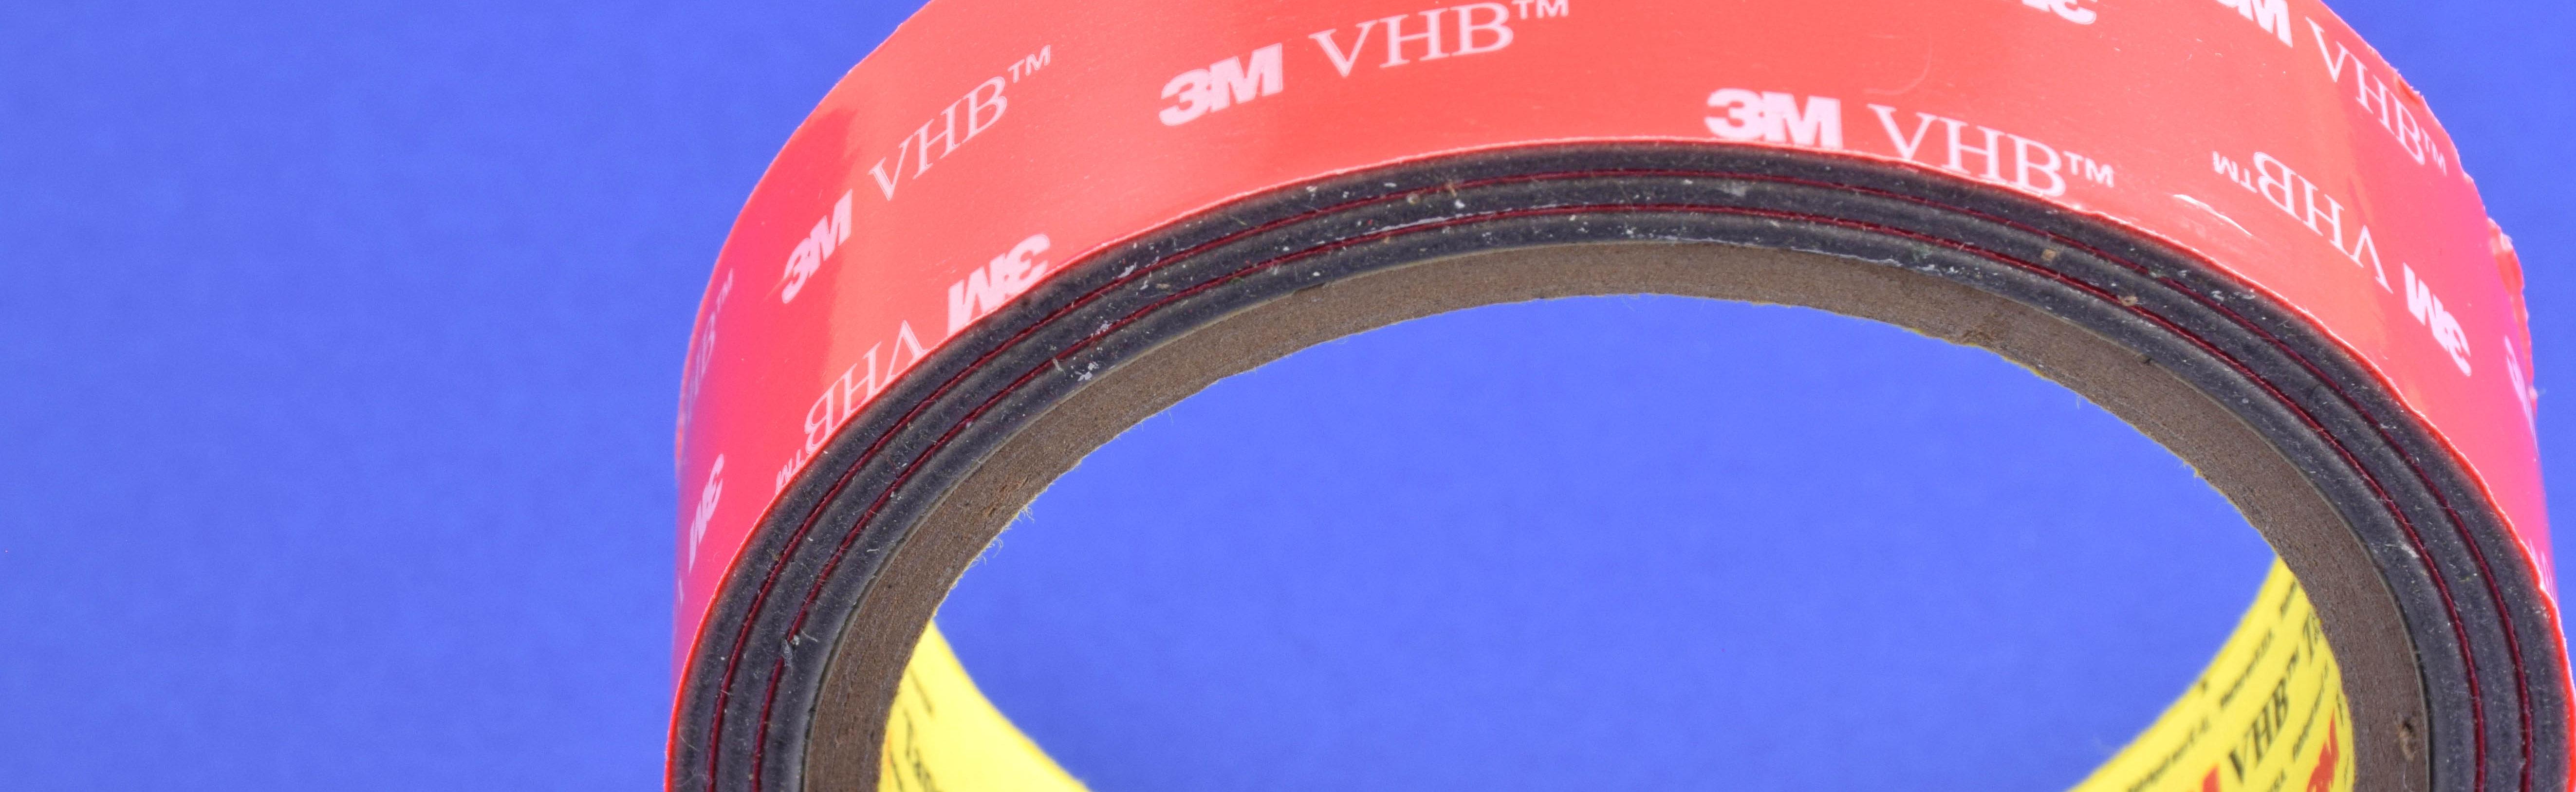 tapes industrial manufacturer 3m vhb